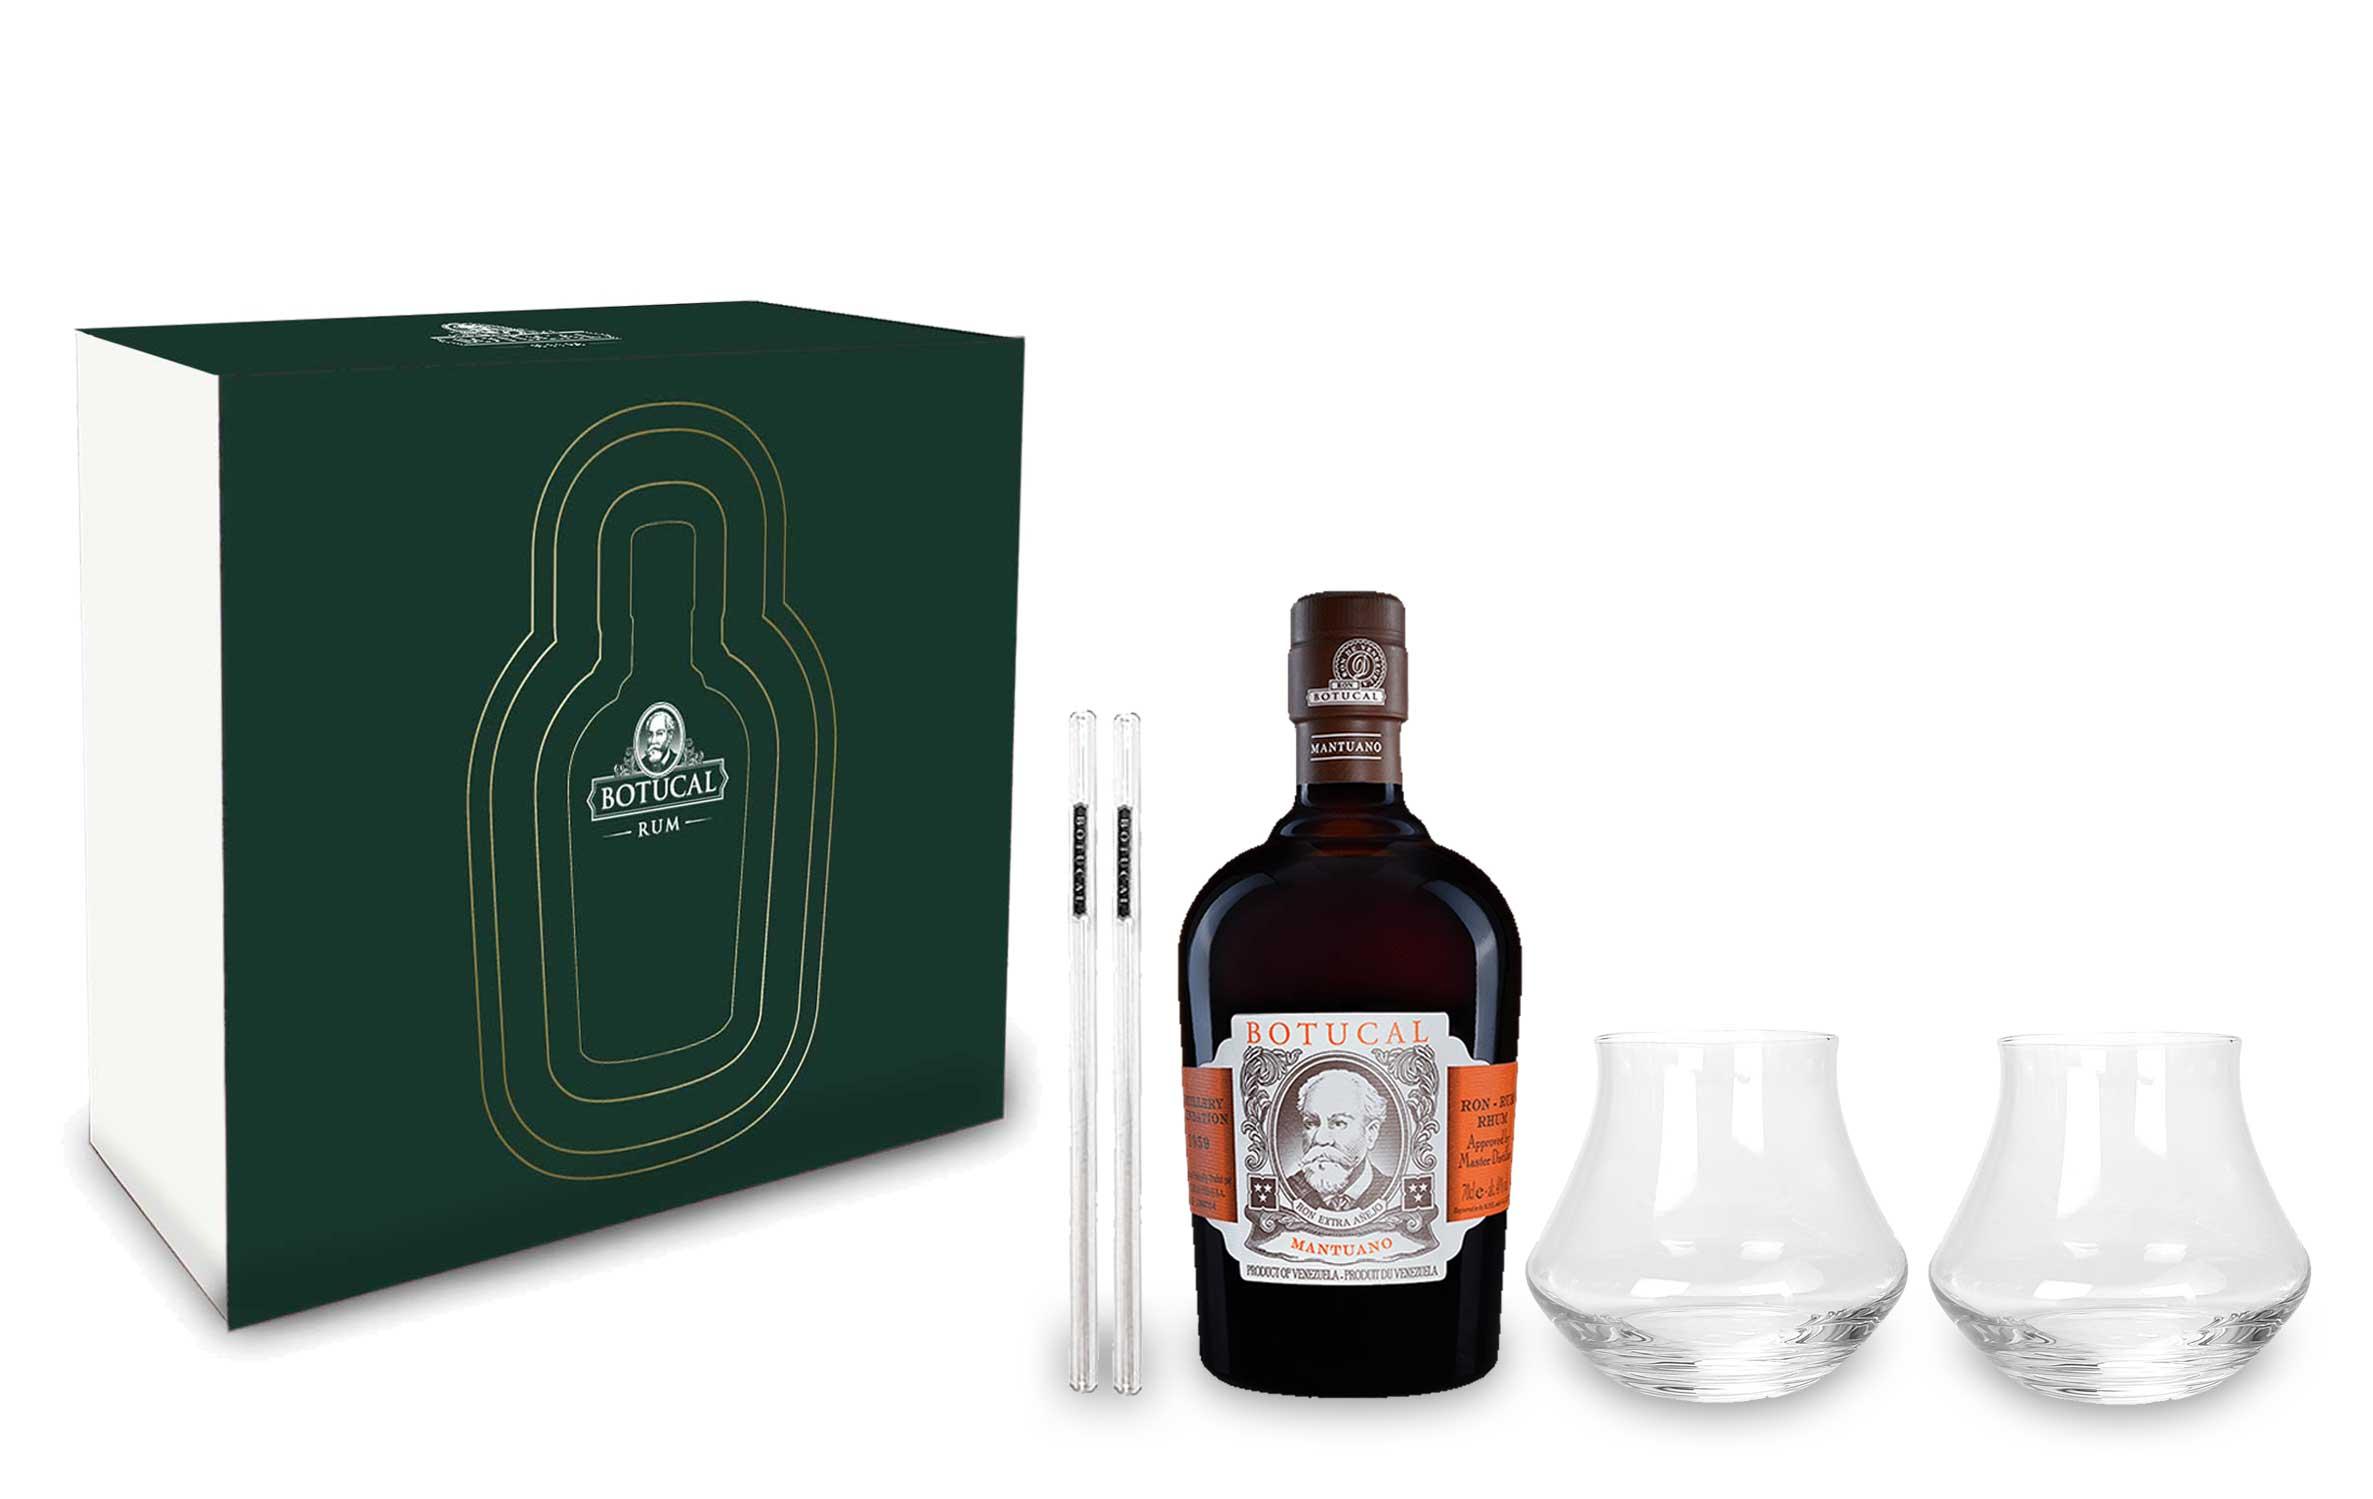 Botucal Mantuano Schuber Geschenkset Ron Extra Anejo 0,7l (40% Vol) + 2x Botucal Glas / Tumbler 2x Botucal Glashalm- [Enthält Sulfite]